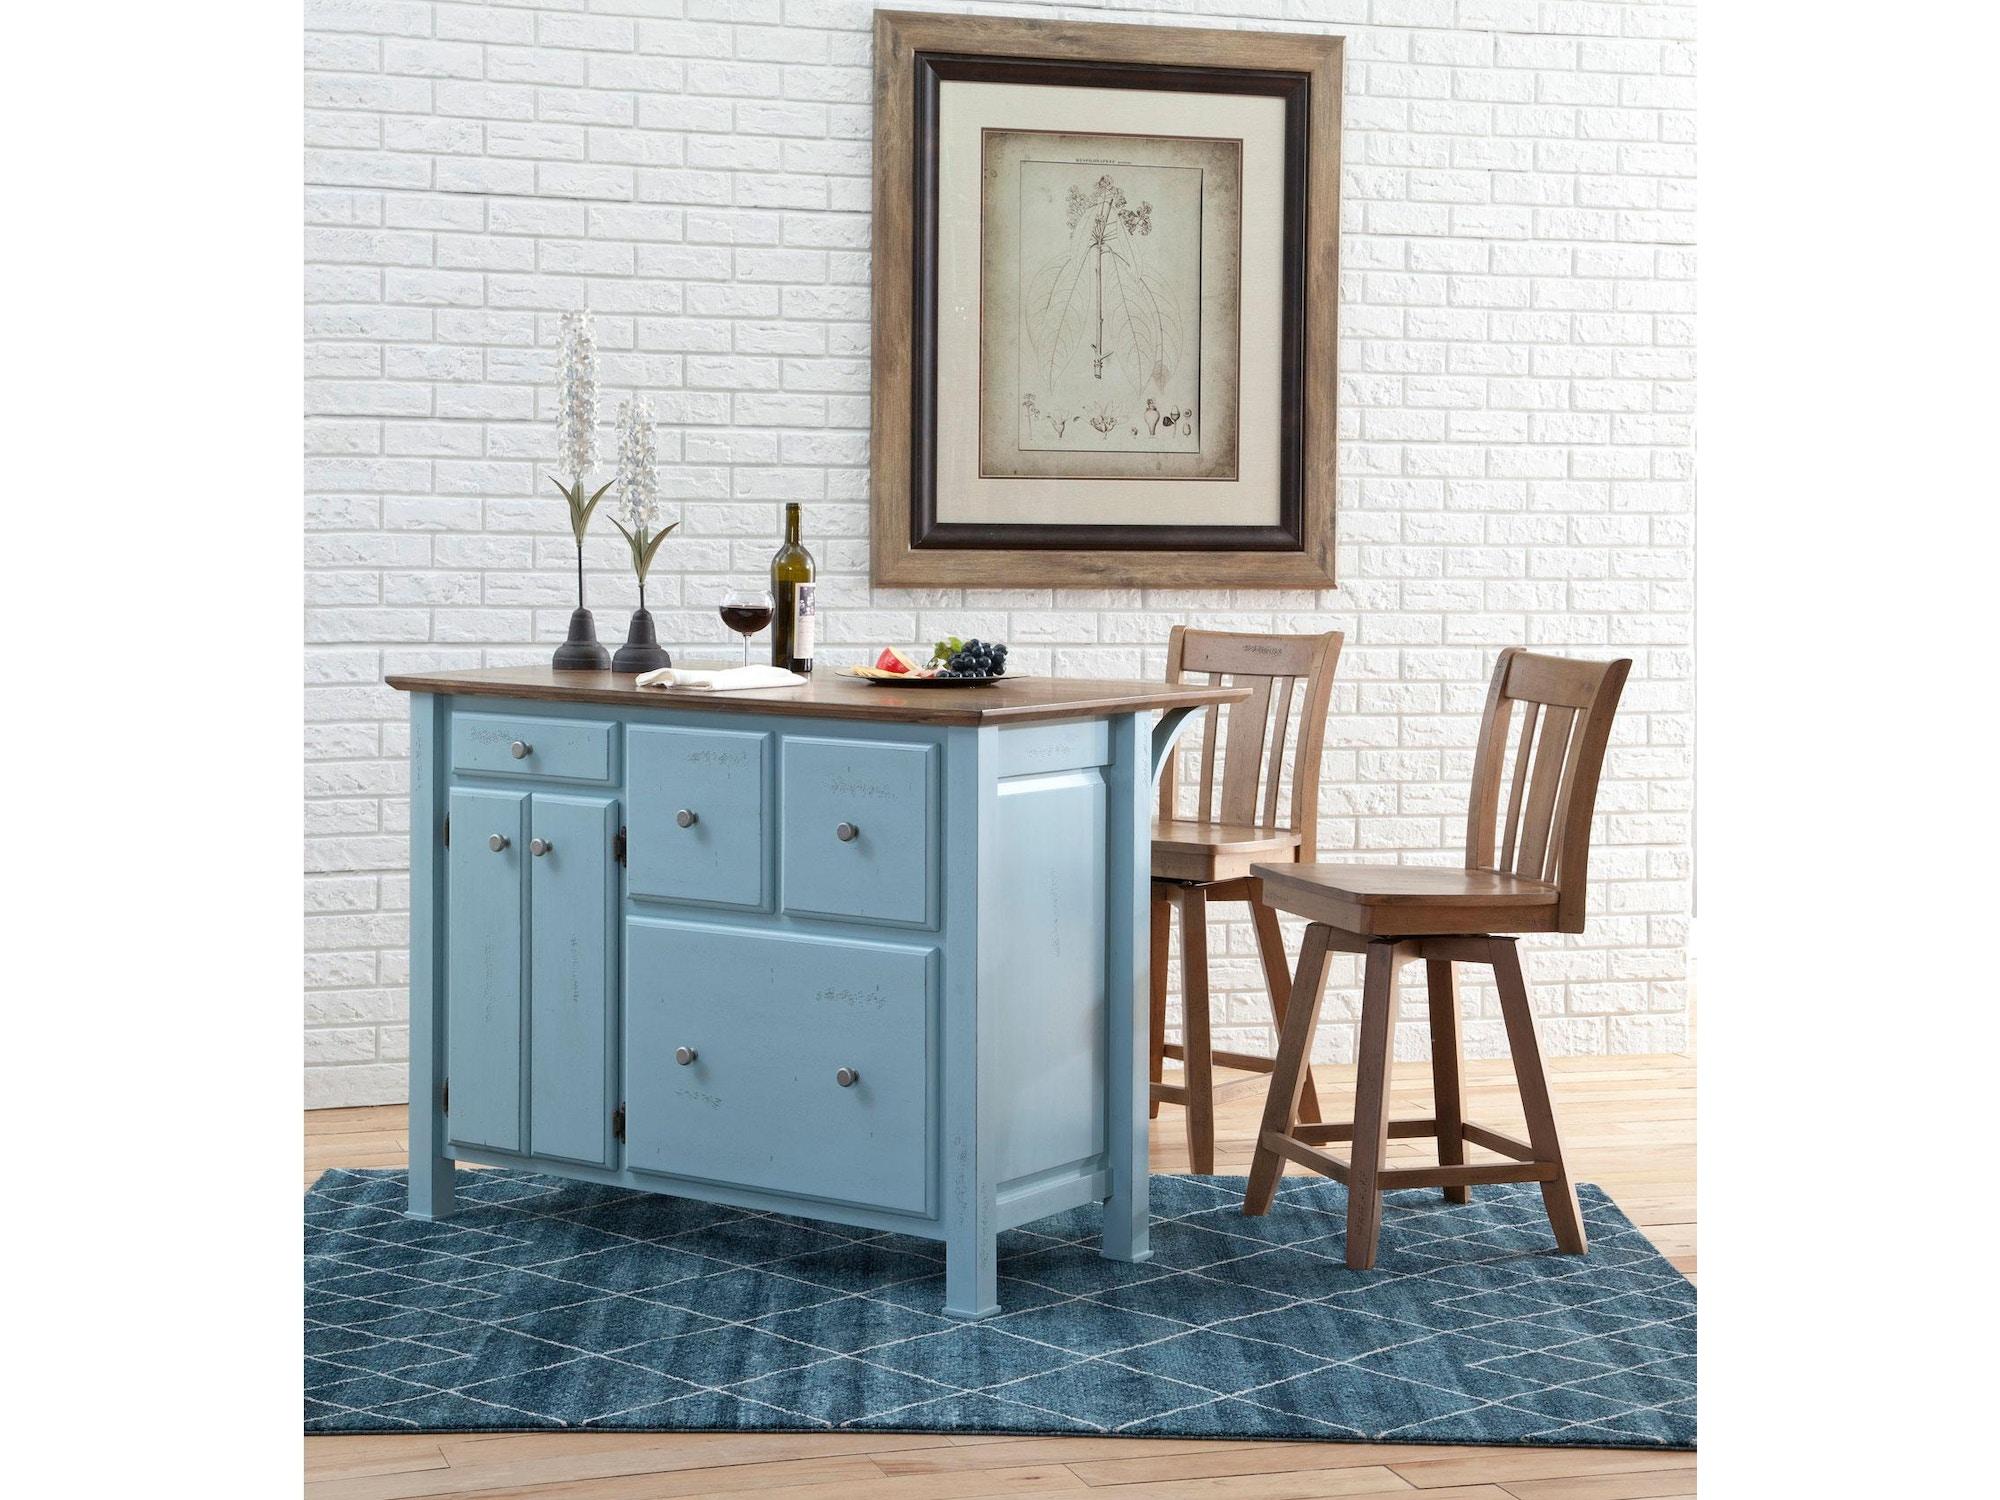 Dining Room Kitchen Islands - Furniture Fair - Cincinnati & Dayton ...